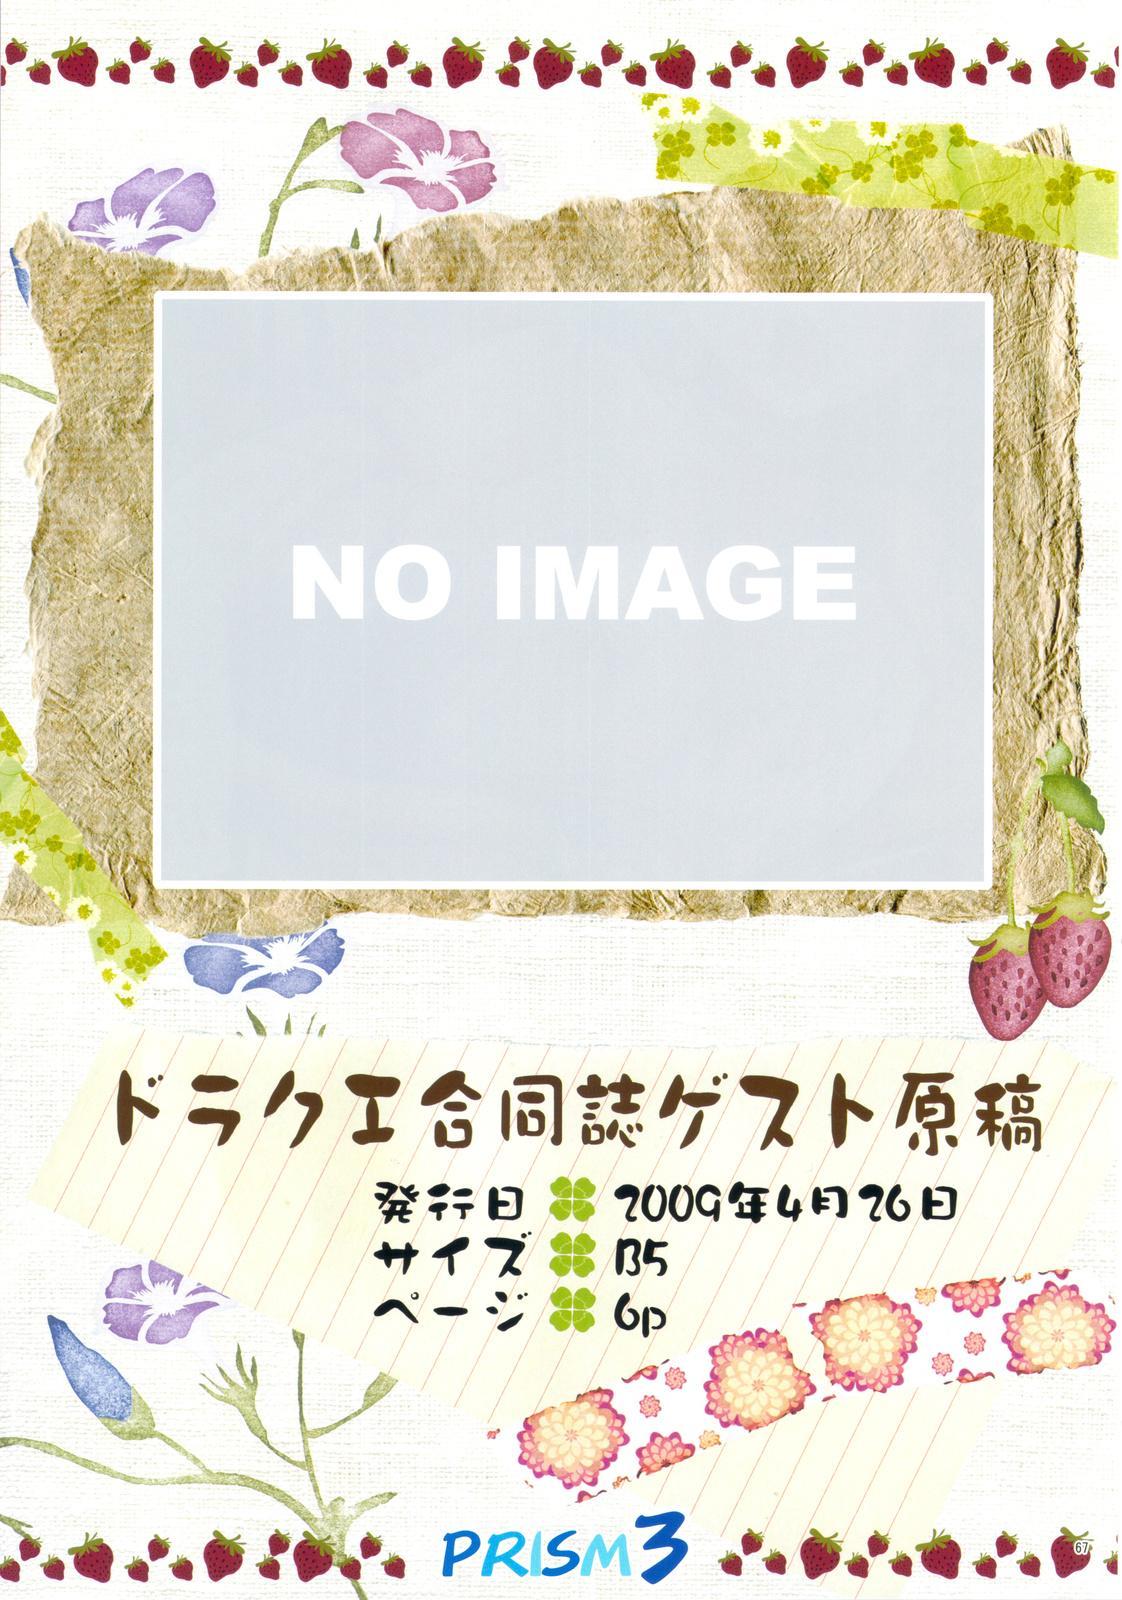 PRISM 3 - Kabayakiya Sariroku shuu 65